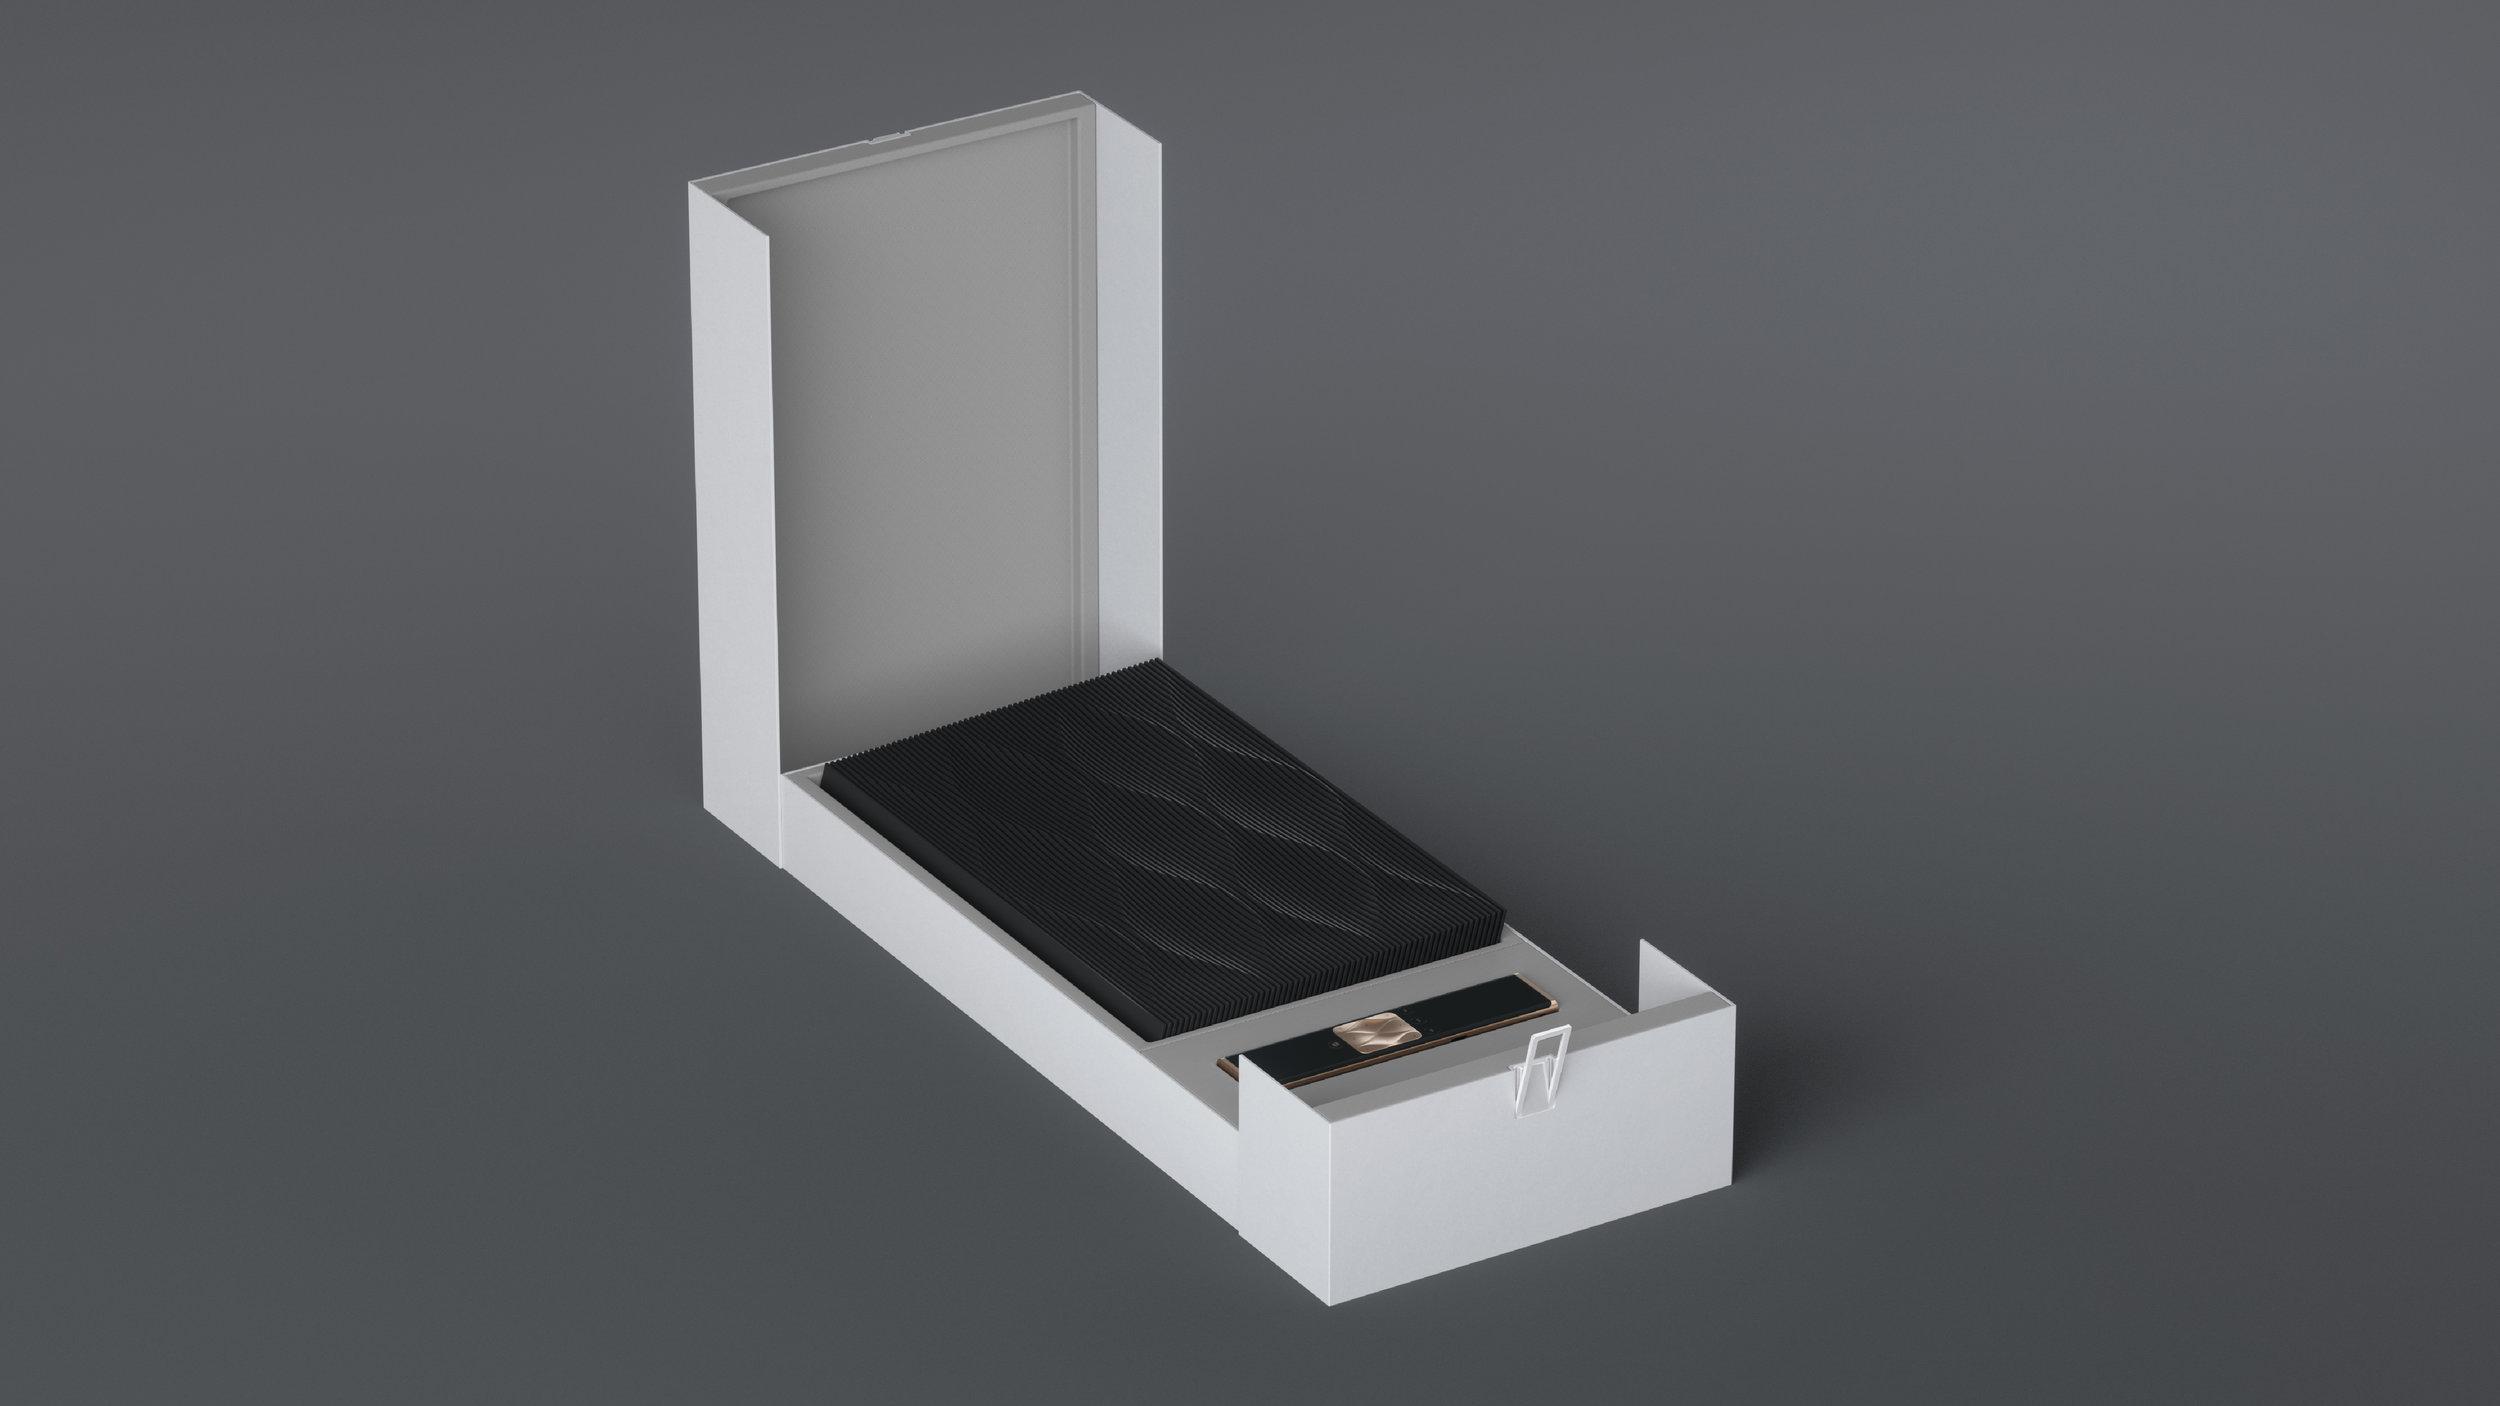 B&W_LibertySuite_PackagingStructure_R174.jpg